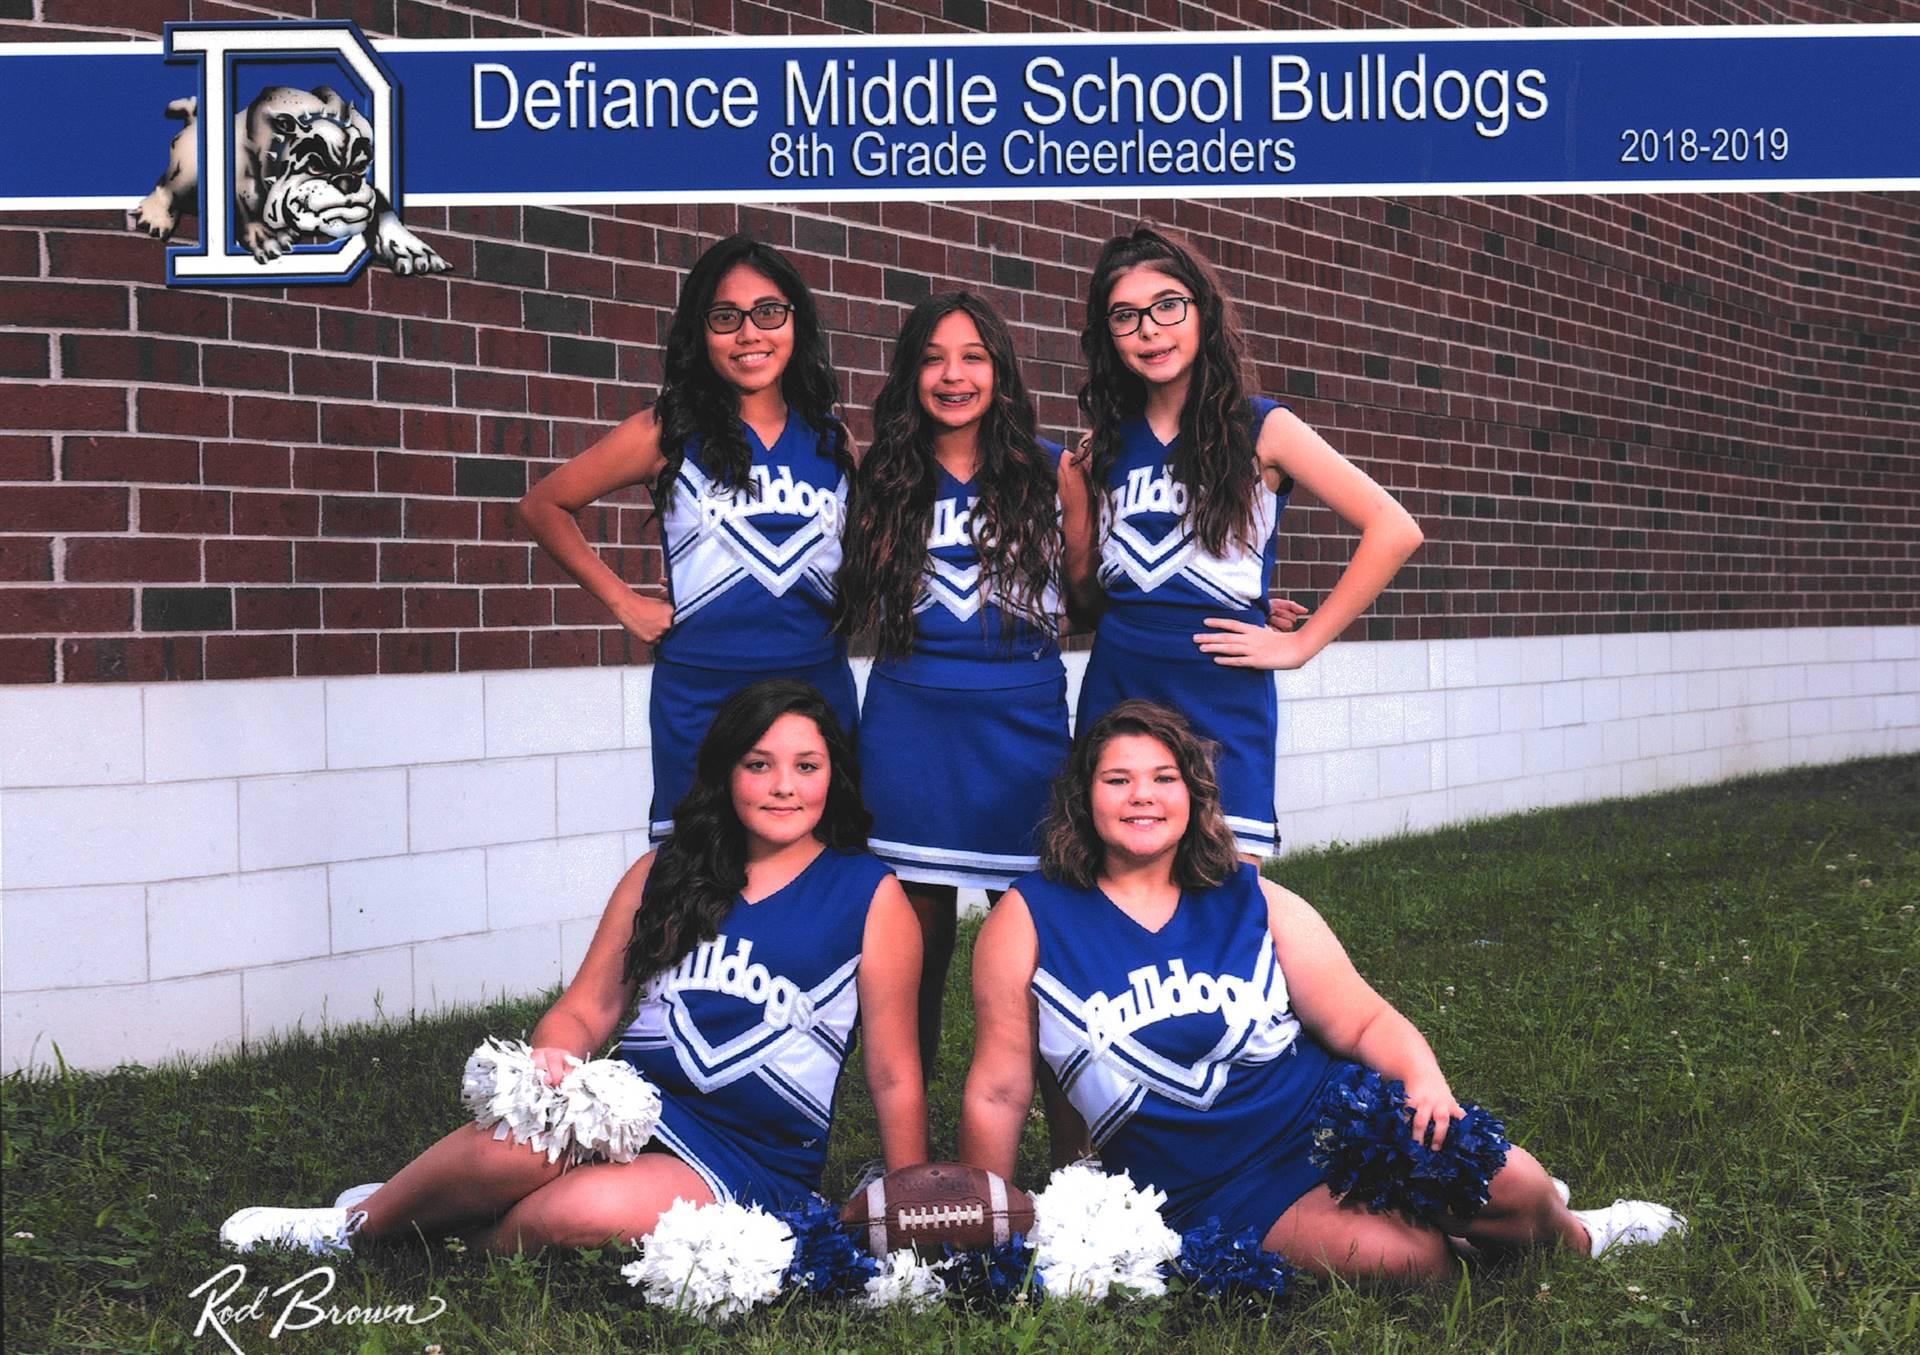 8th Grade Cheerleaders-Fall 2018